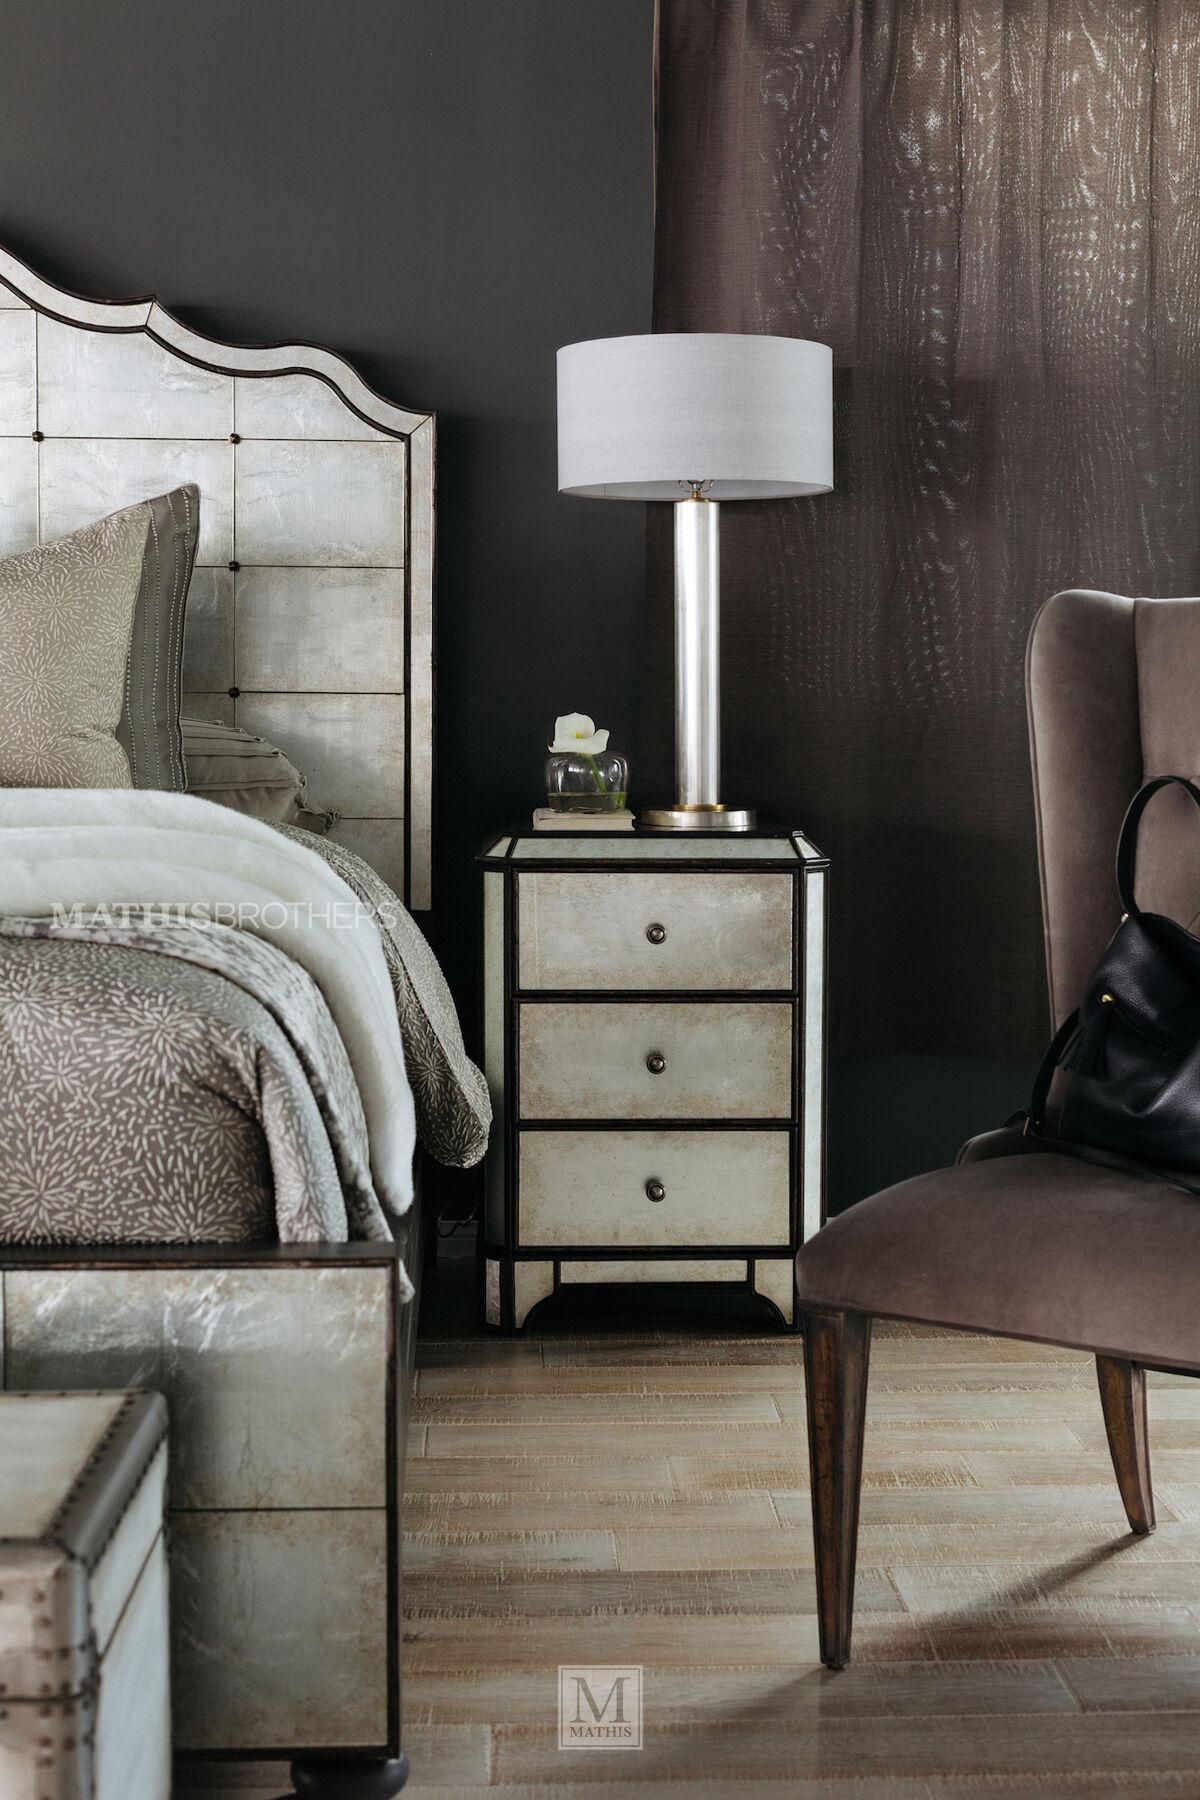 hooker arabella mirrored threedrawer nightstand